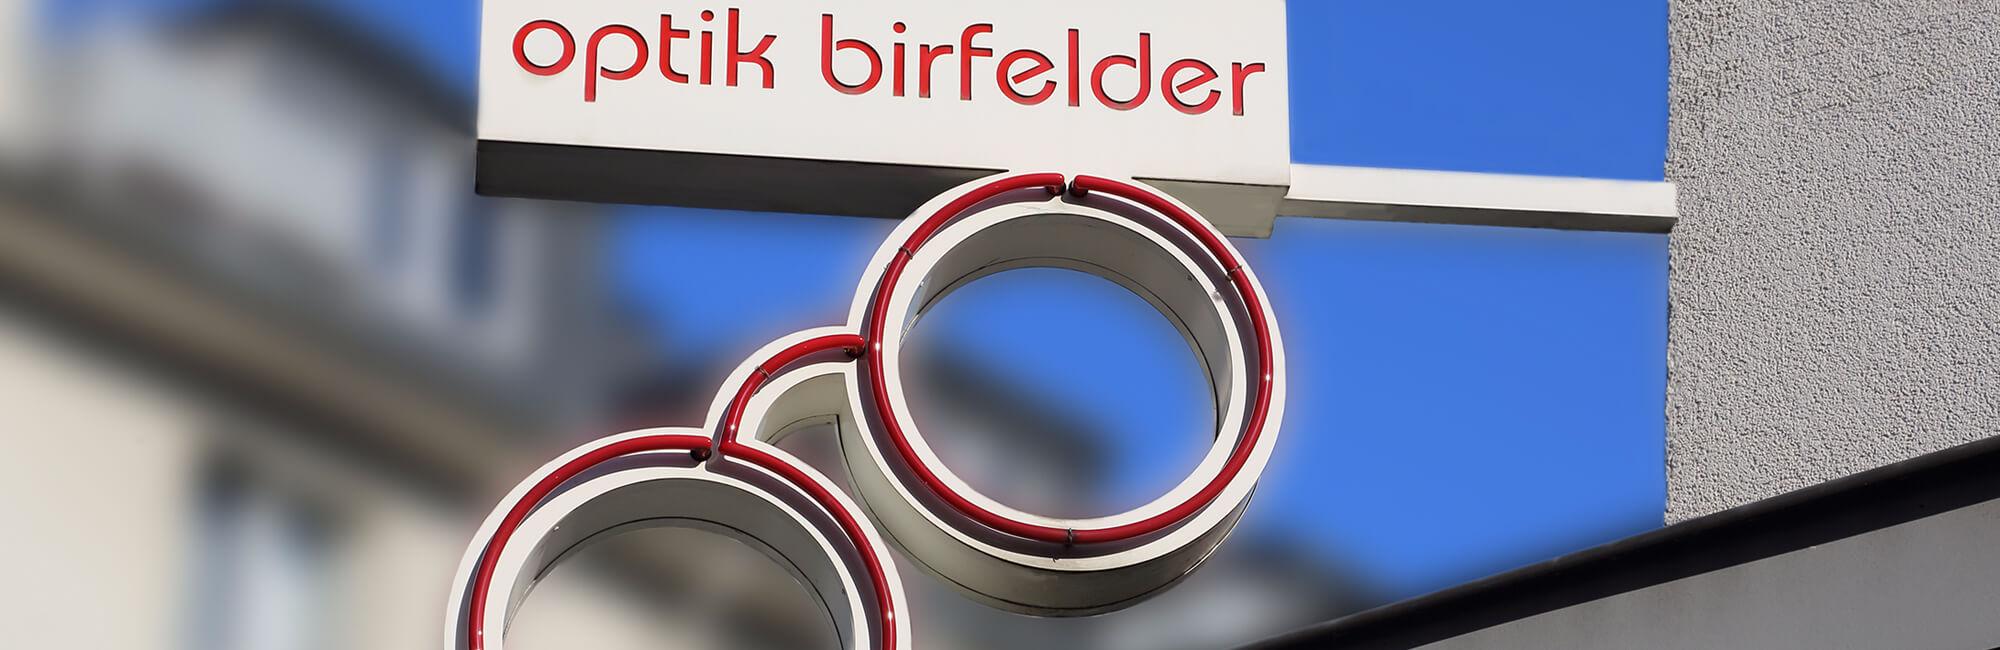 Birfelder Brillen Optiker Logo Schild